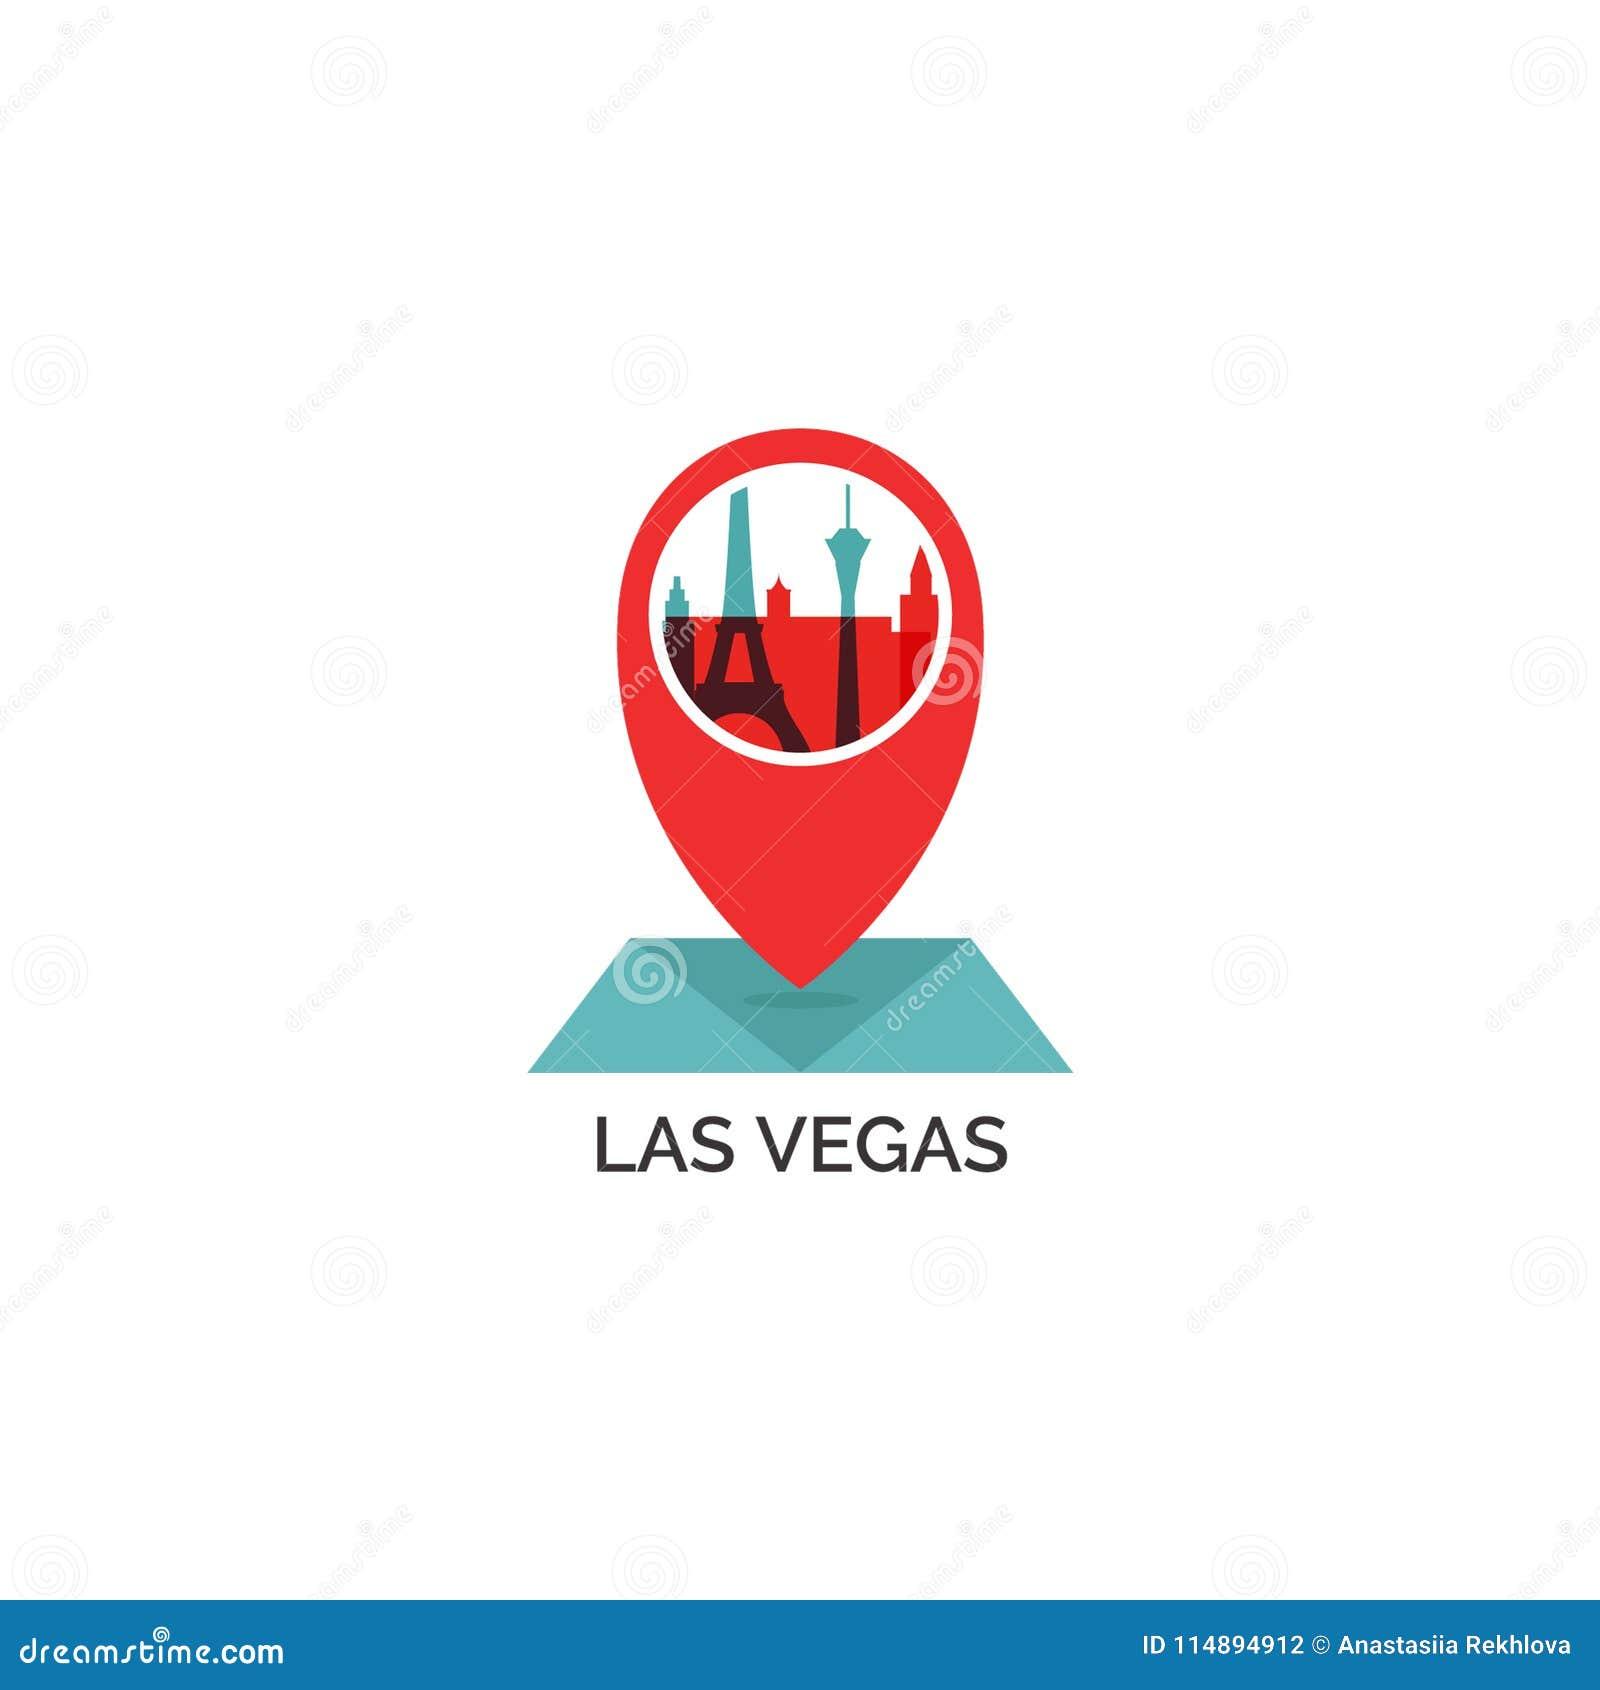 Las Vegas City Skyline Silhouette Vector Logo Illustration ...